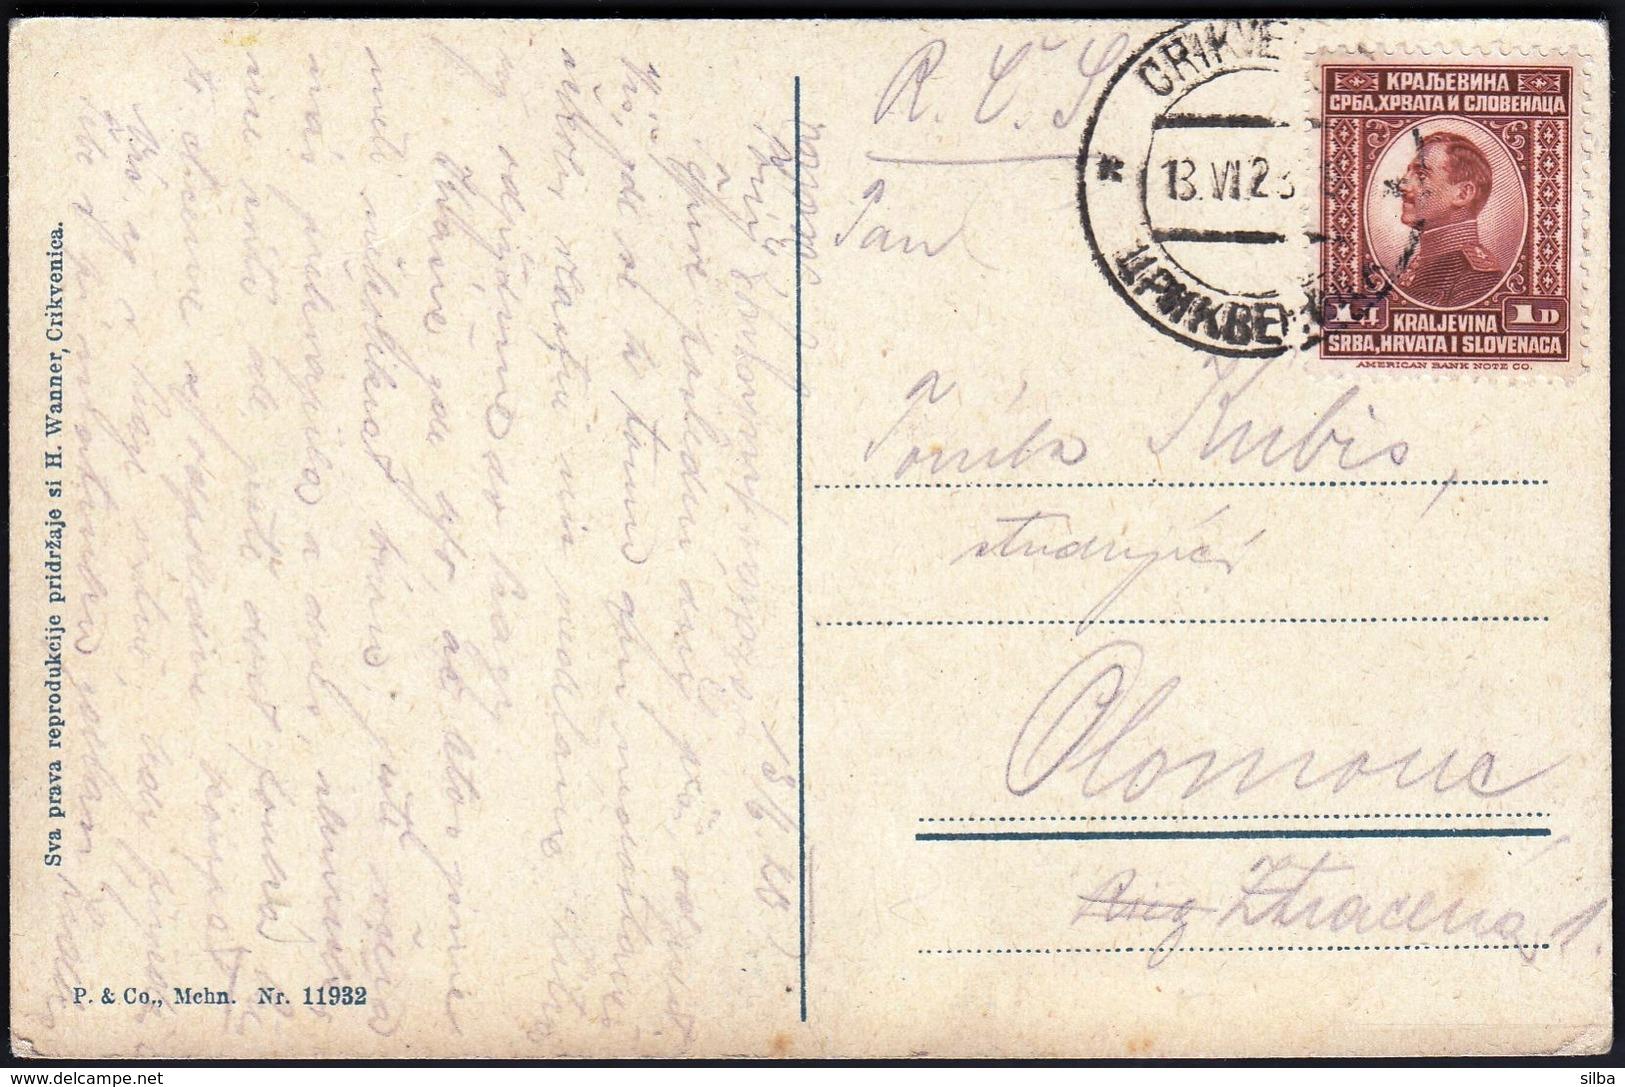 Croatia Crikvenica 1923  / Luka, Hafen, Port, Ships / Kingdom SHS / Mehn 11932 - Croatie